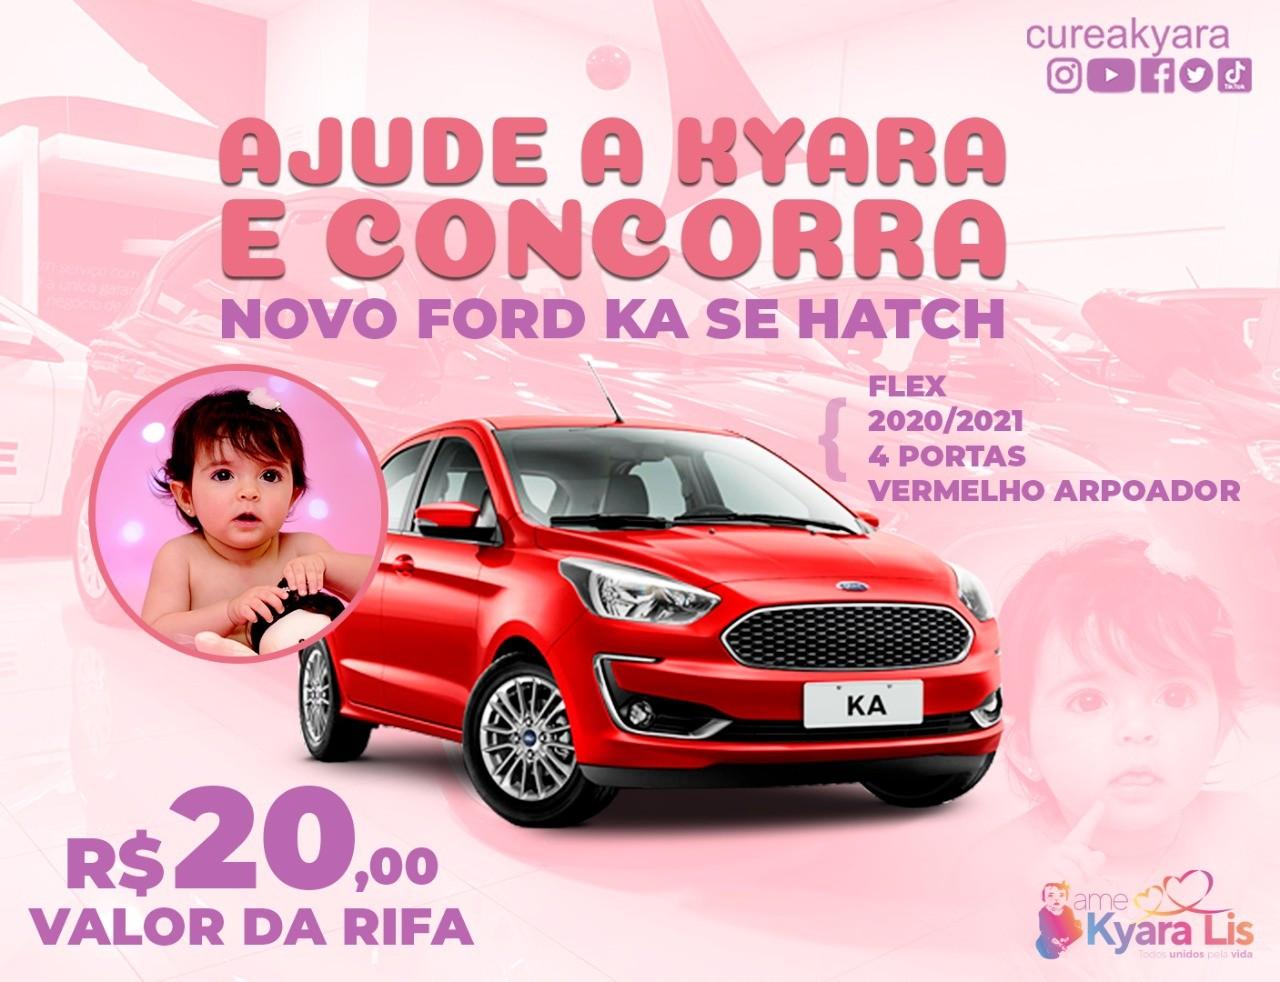 Foto  - @cureakyara - Novo Ford Ka SE Hatch